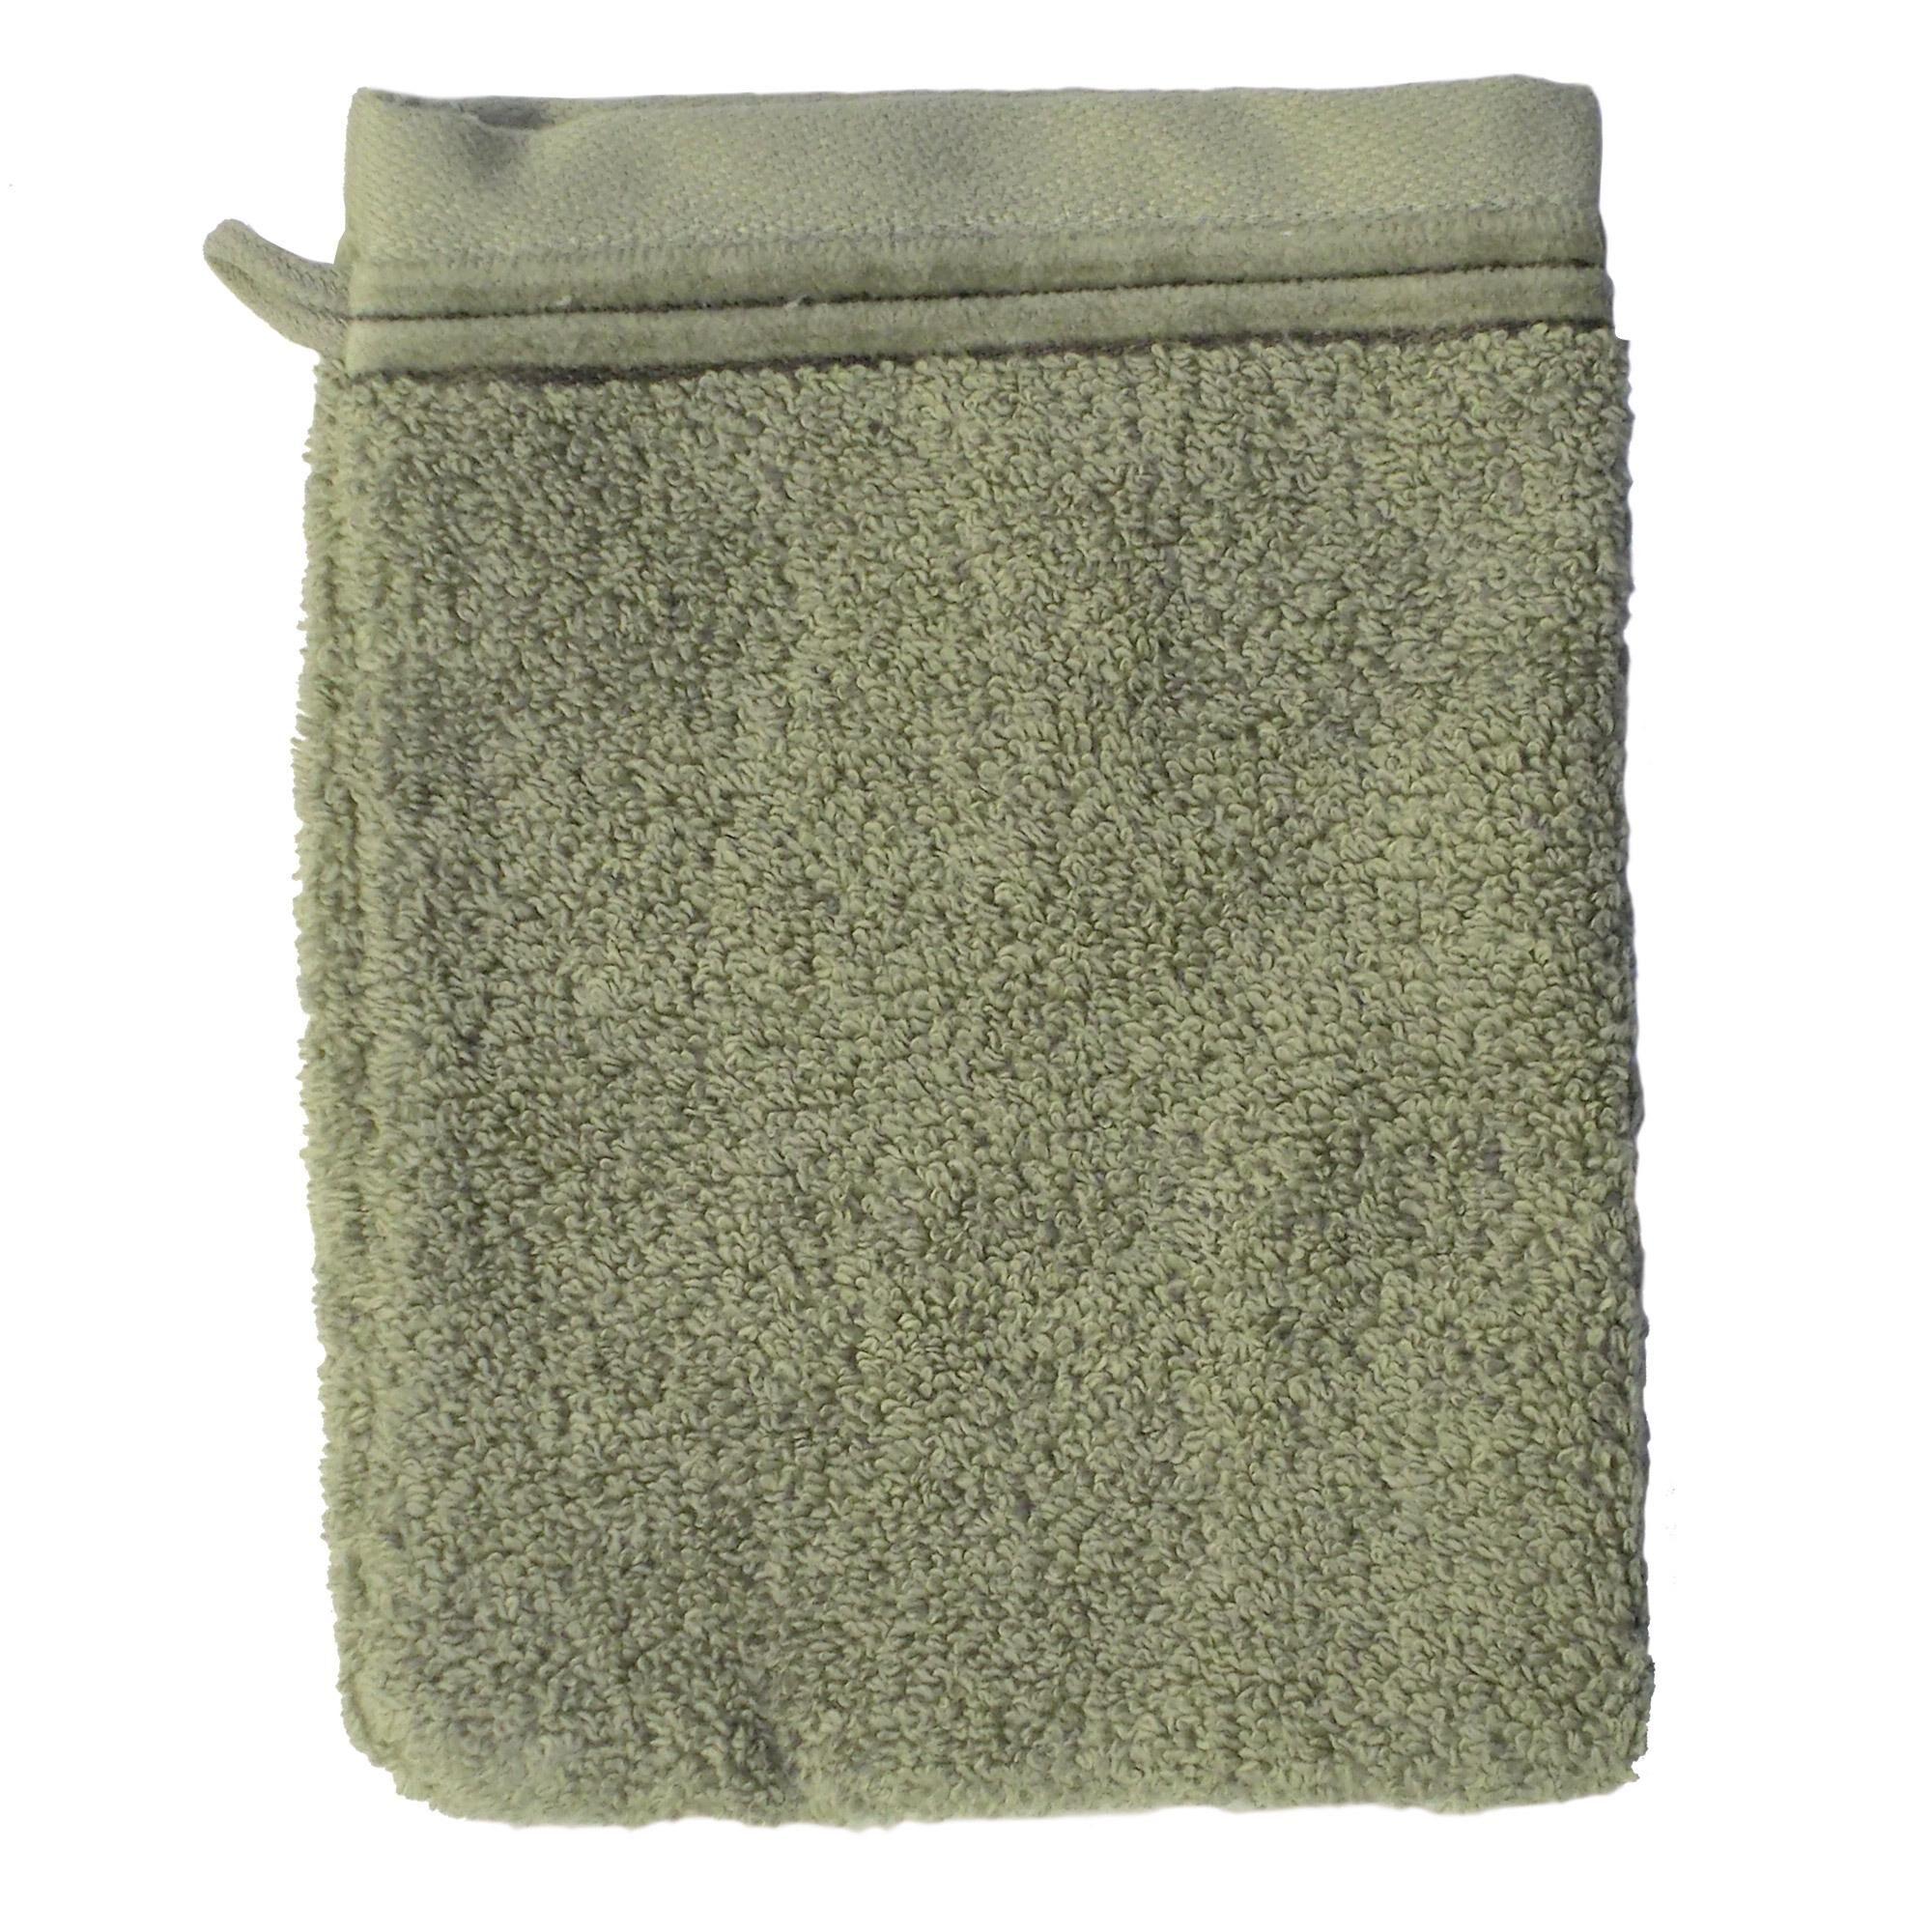 Linnea Gant de toilette 16x21 cm JULIET Vert 520 g/m2